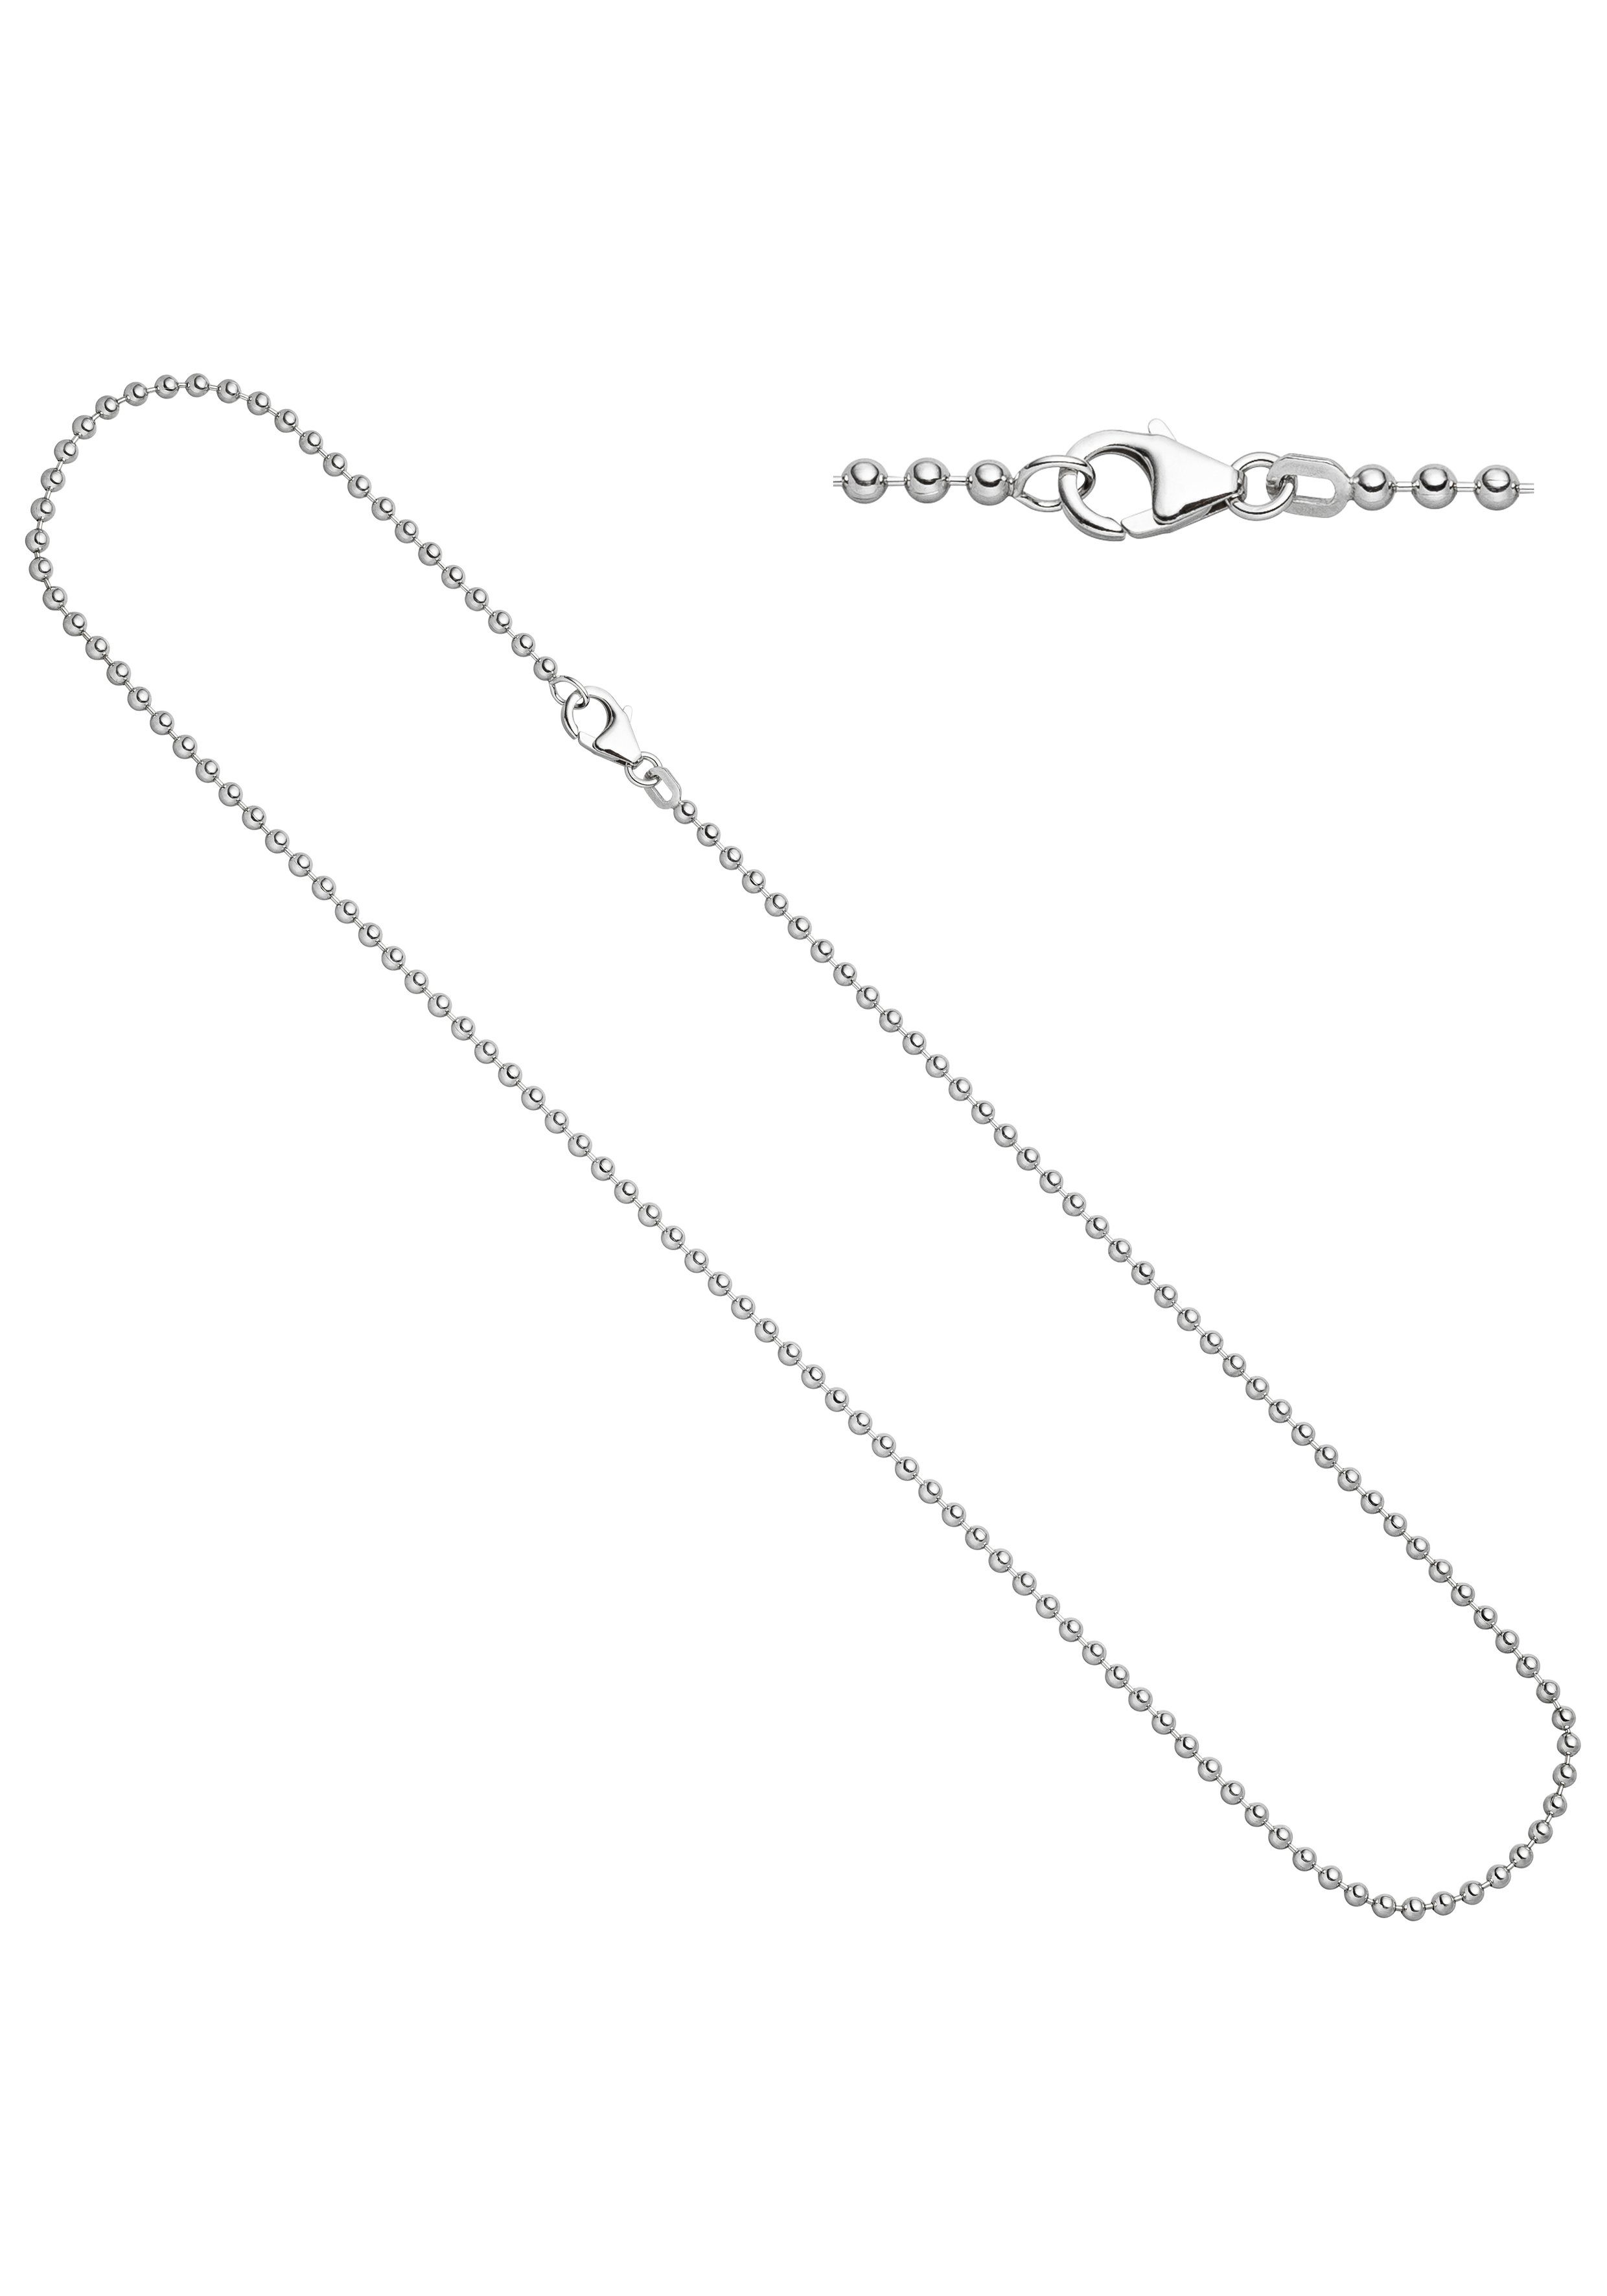 JOBO Silberkette Kugelkette 925 Silber 60 cm 3,0 mm